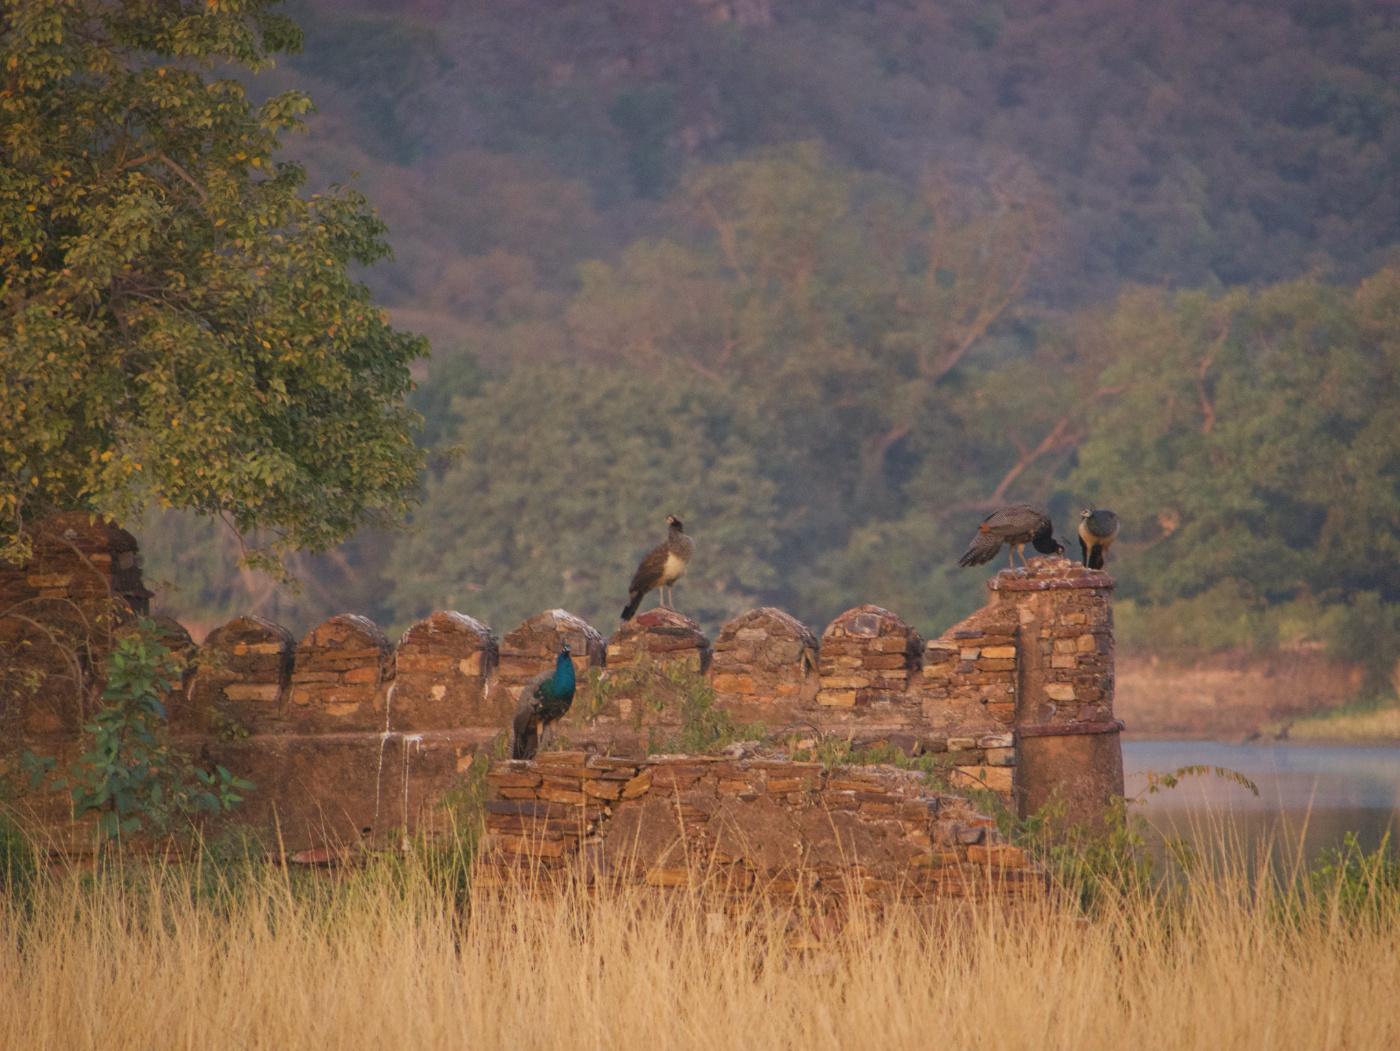 094-India-Ranthambore